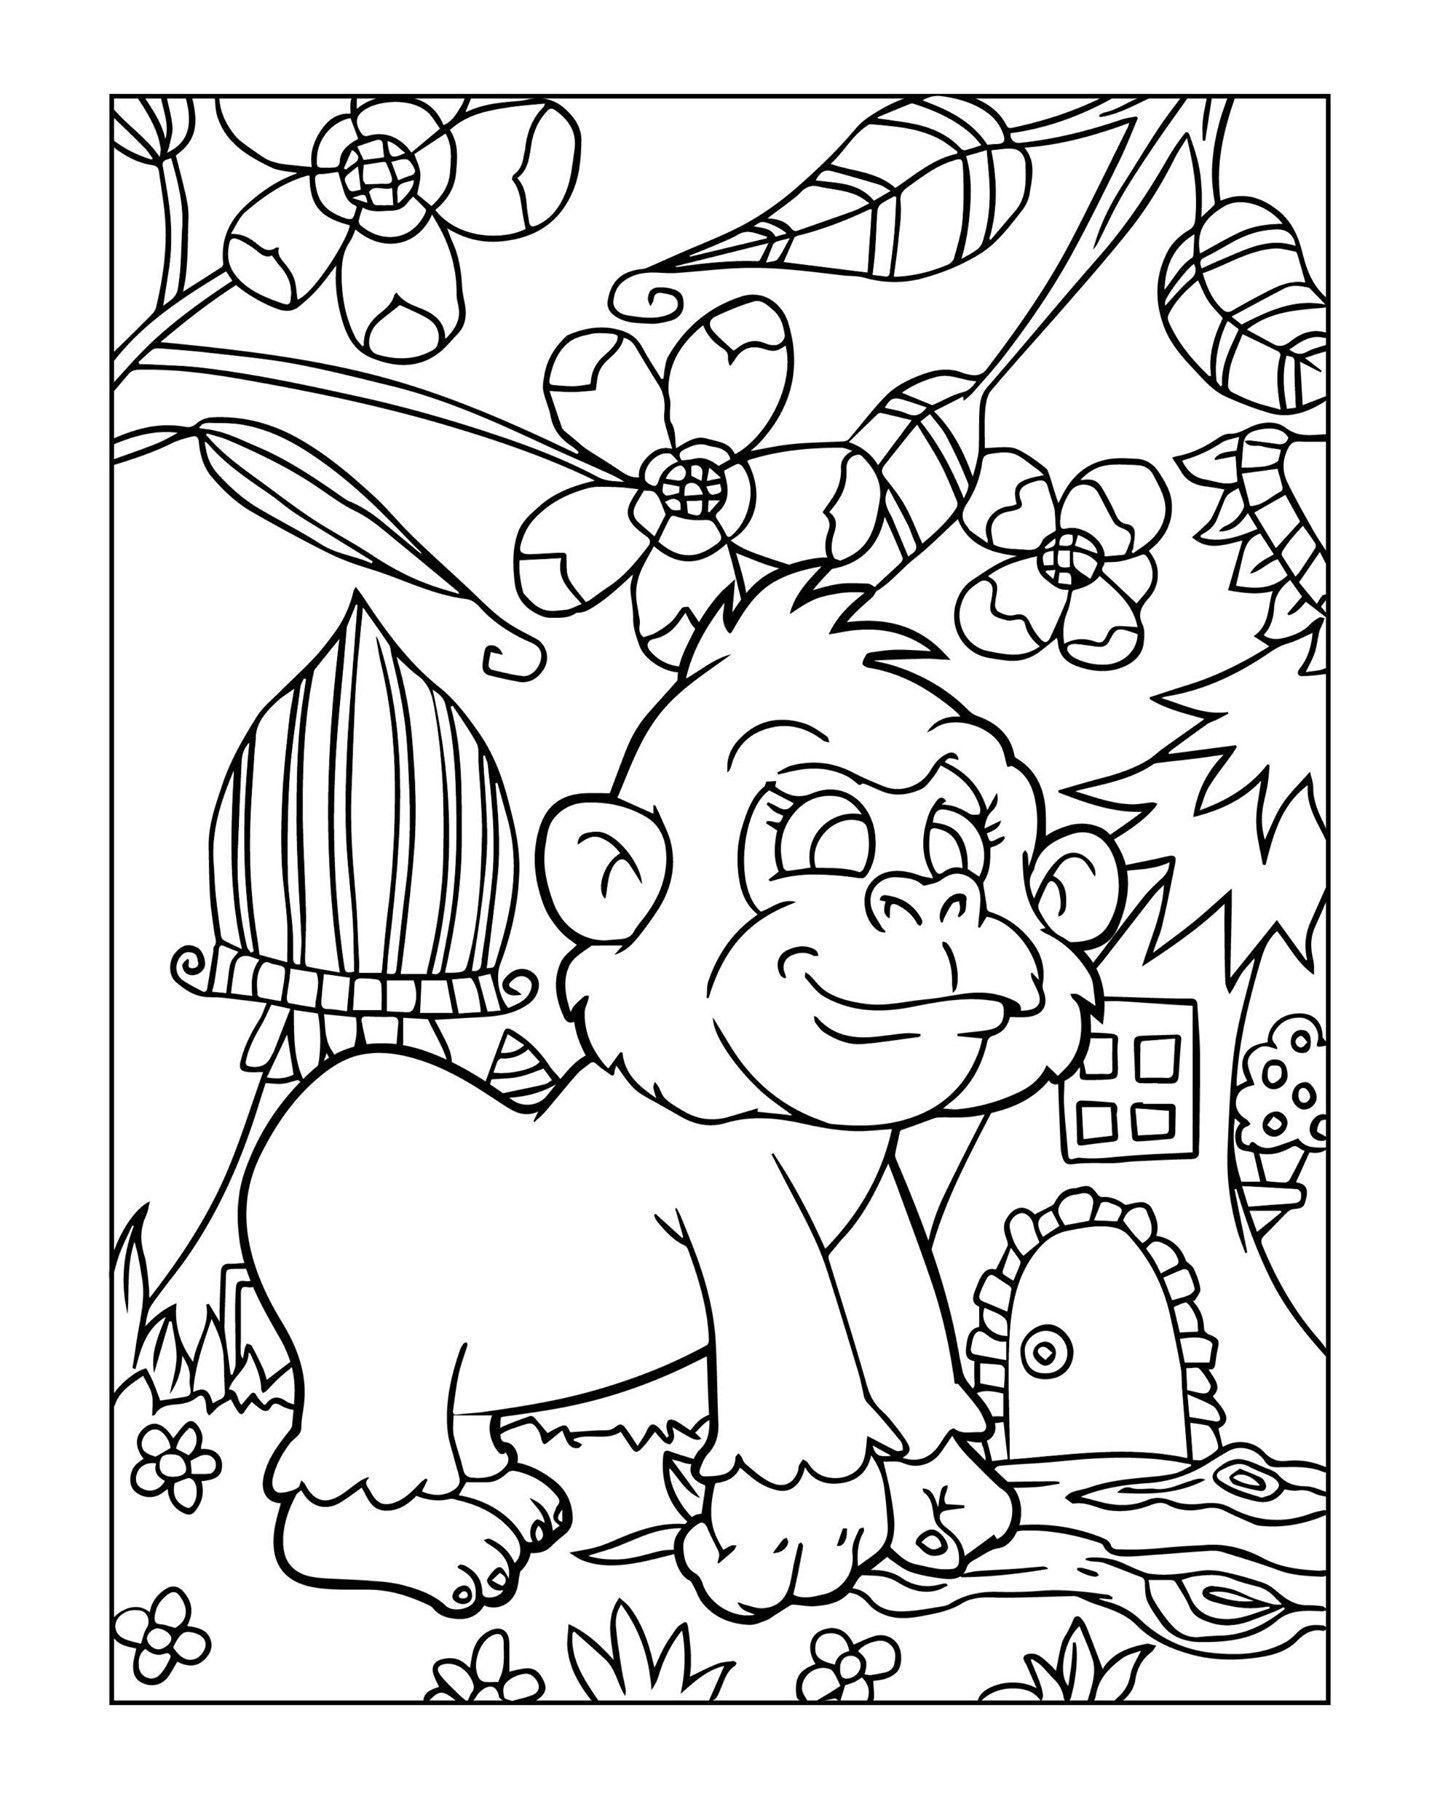 Zoo Animal Coloring Page 7 Zoo Animal Coloring Pages Animal Coloring Pages Coloring Pages [ 1799 x 1440 Pixel ]